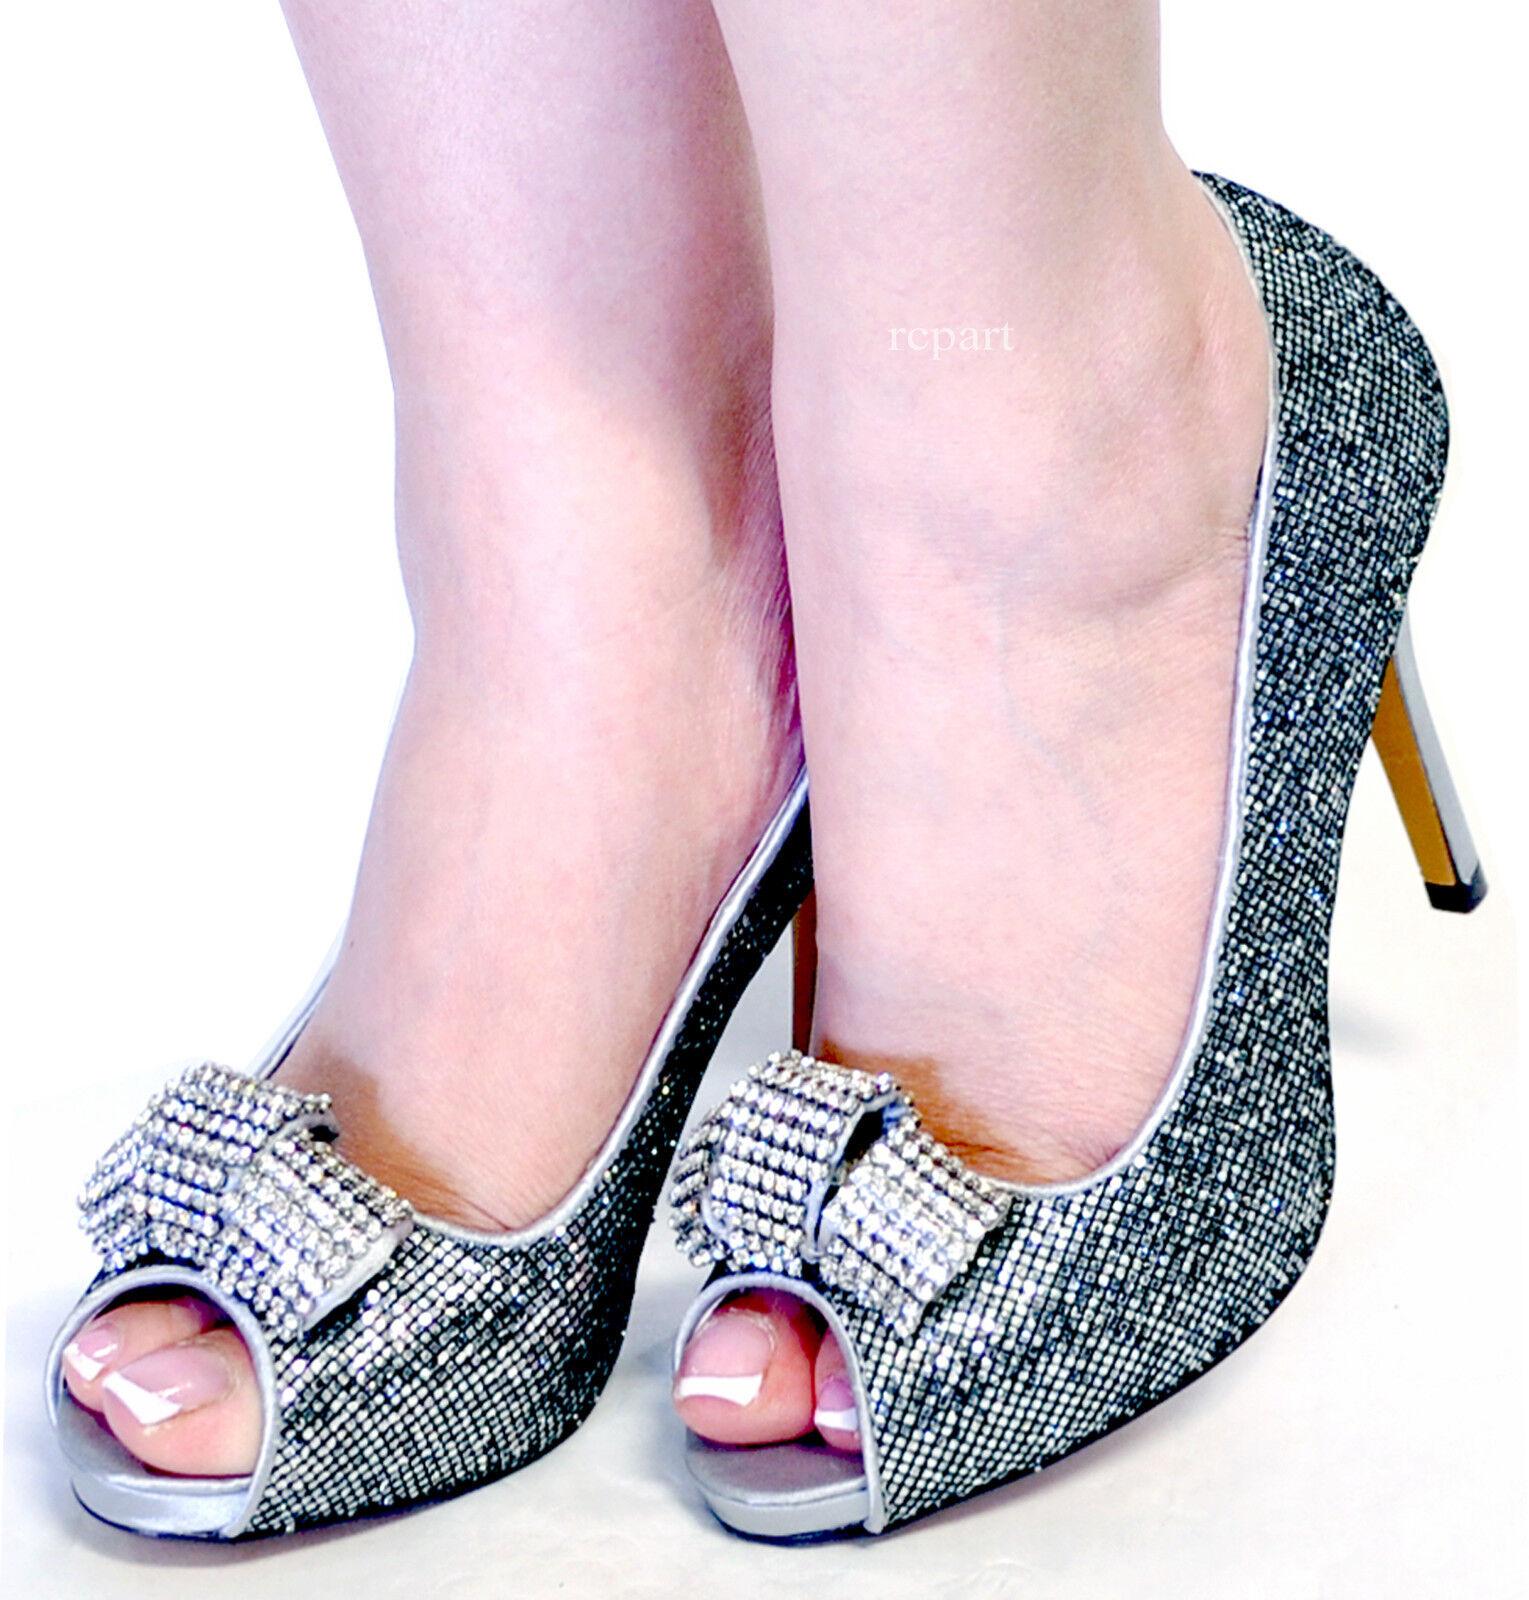 Nuevo De Para Mujer zapatos  Strass De Nuevo Aguja Peep Toe Fiesta Baile Boda Plata eu39 ab44bc